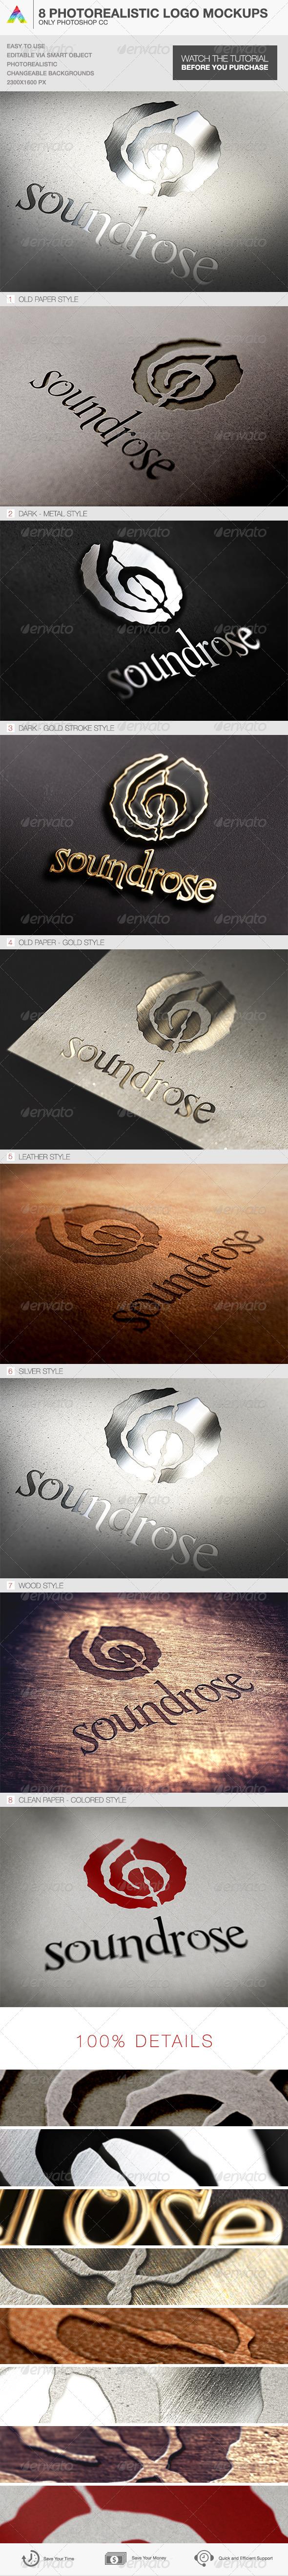 GraphicRiver 8 Photorealistic Logo Mockups 7111538